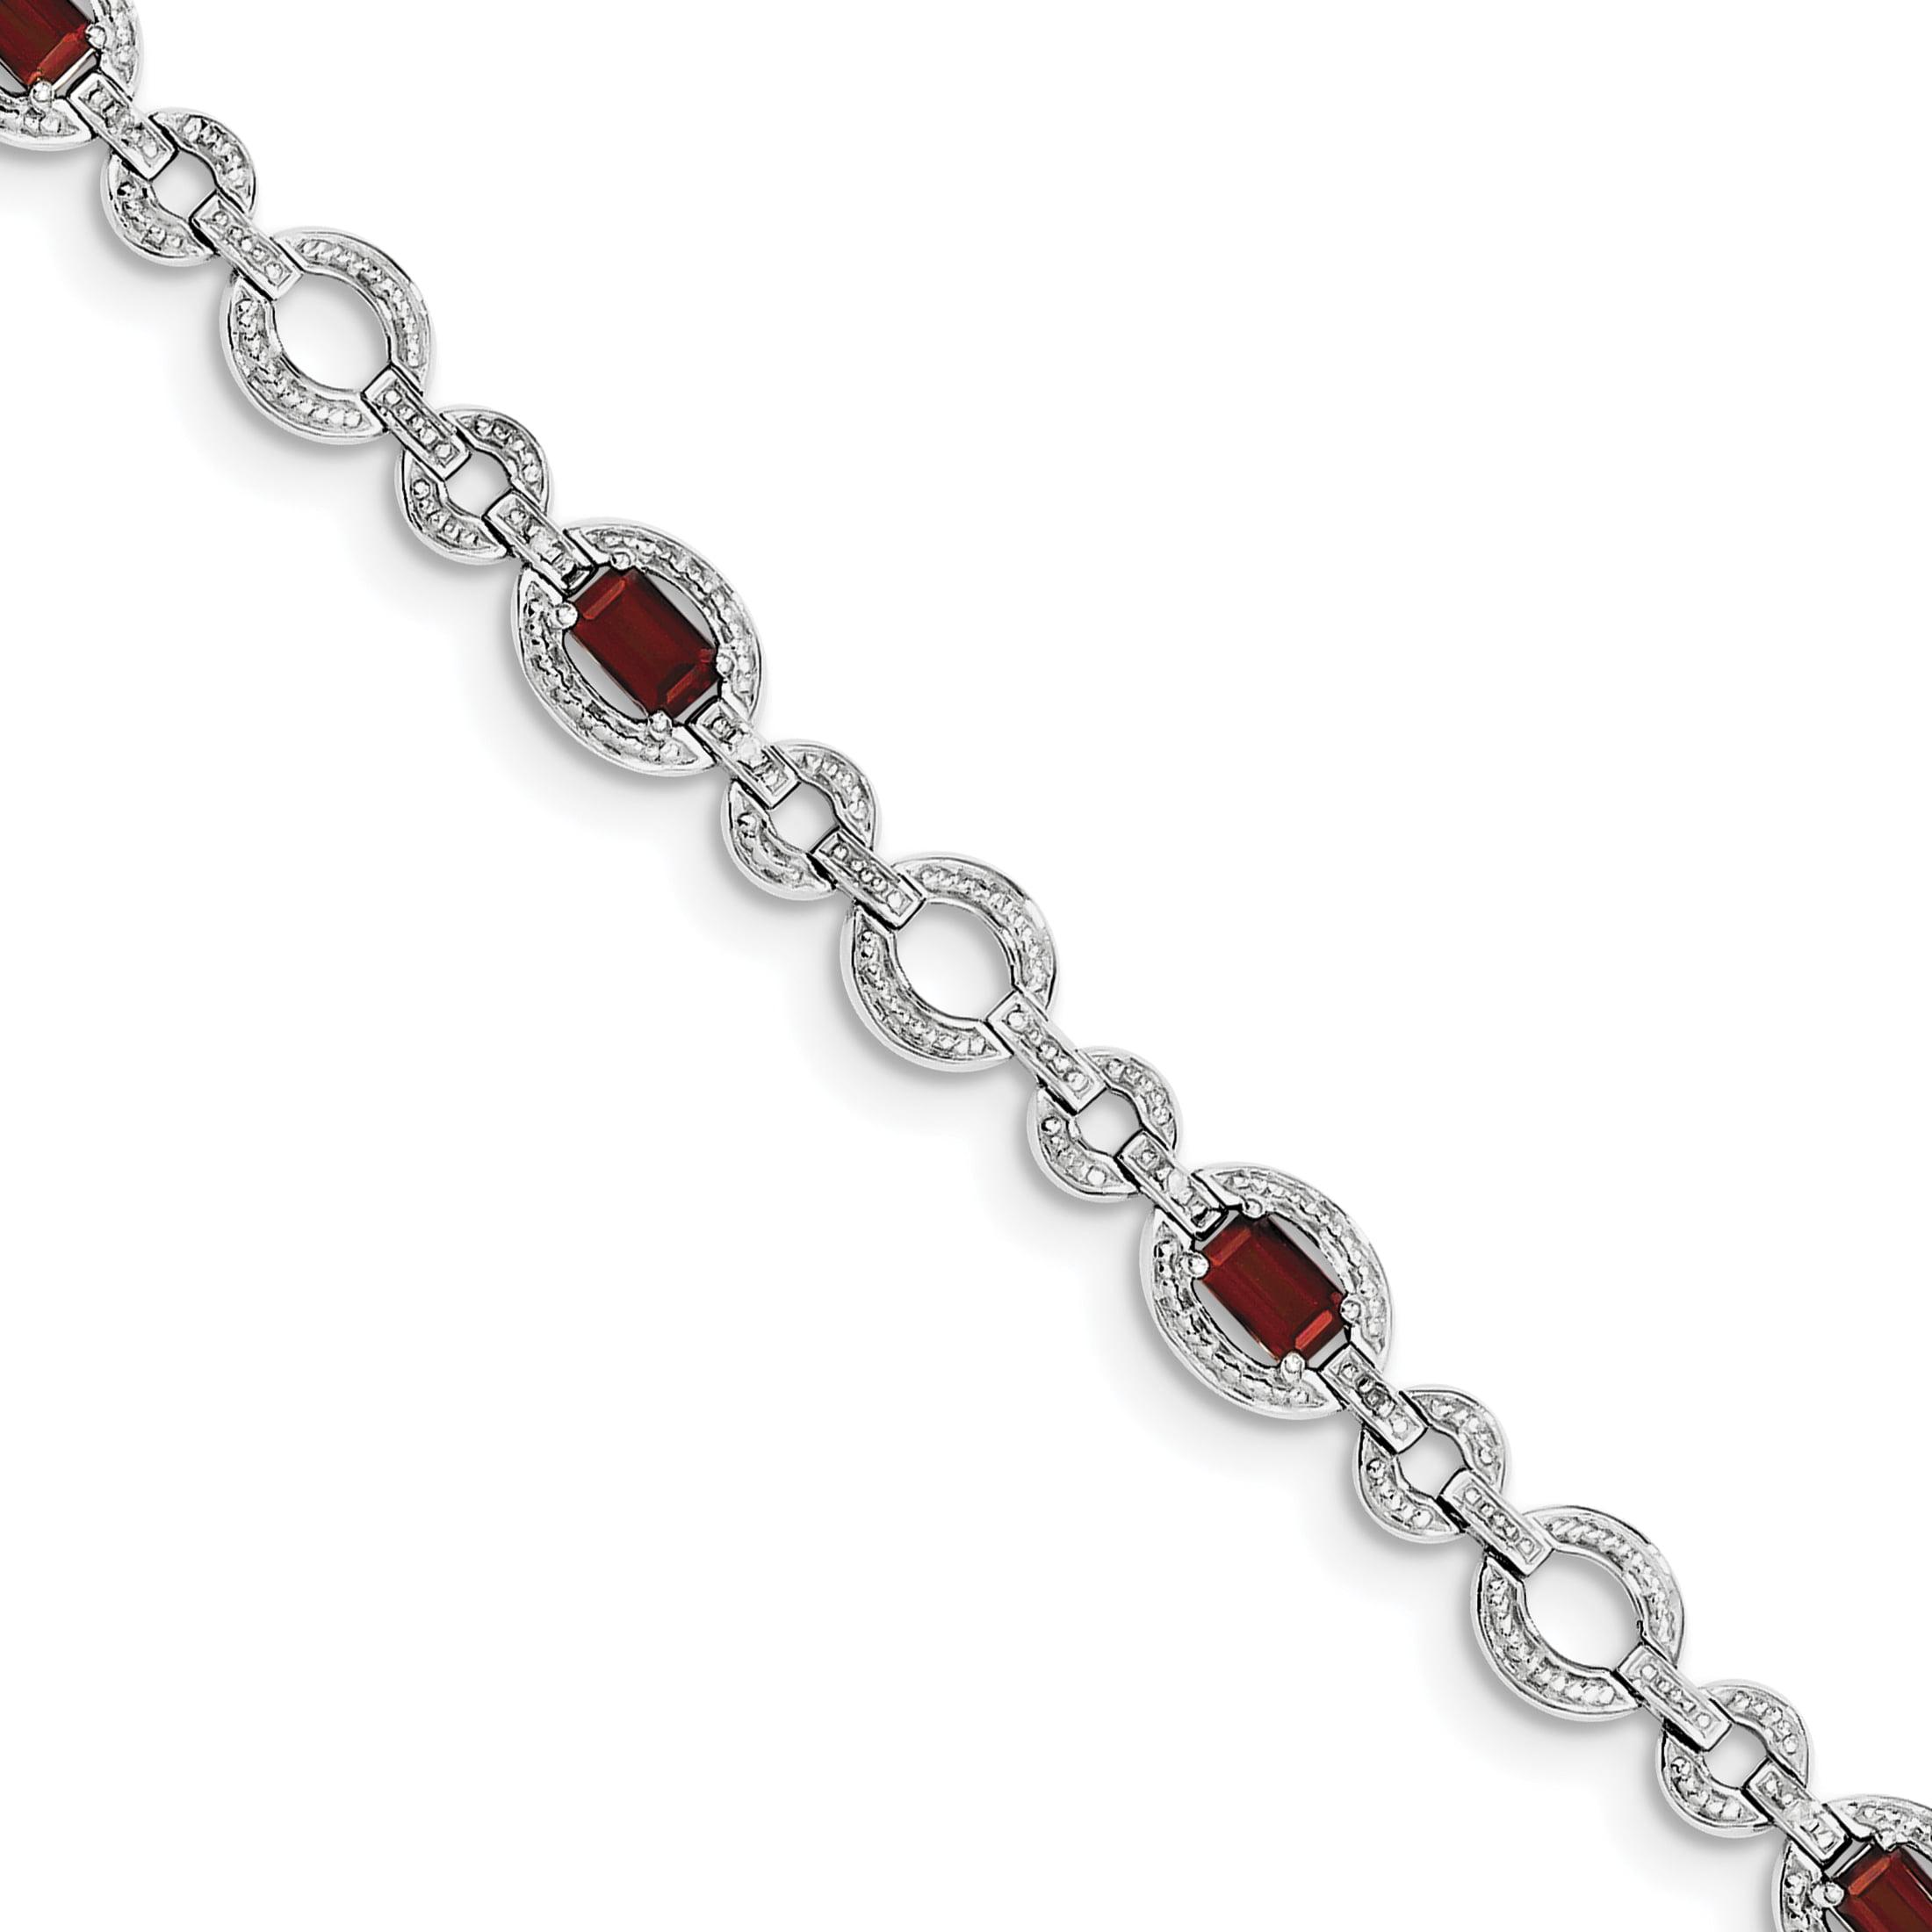 925 Sterling Silver Rhodium-plated Diamond & Garnet Oval Link Bracelet by